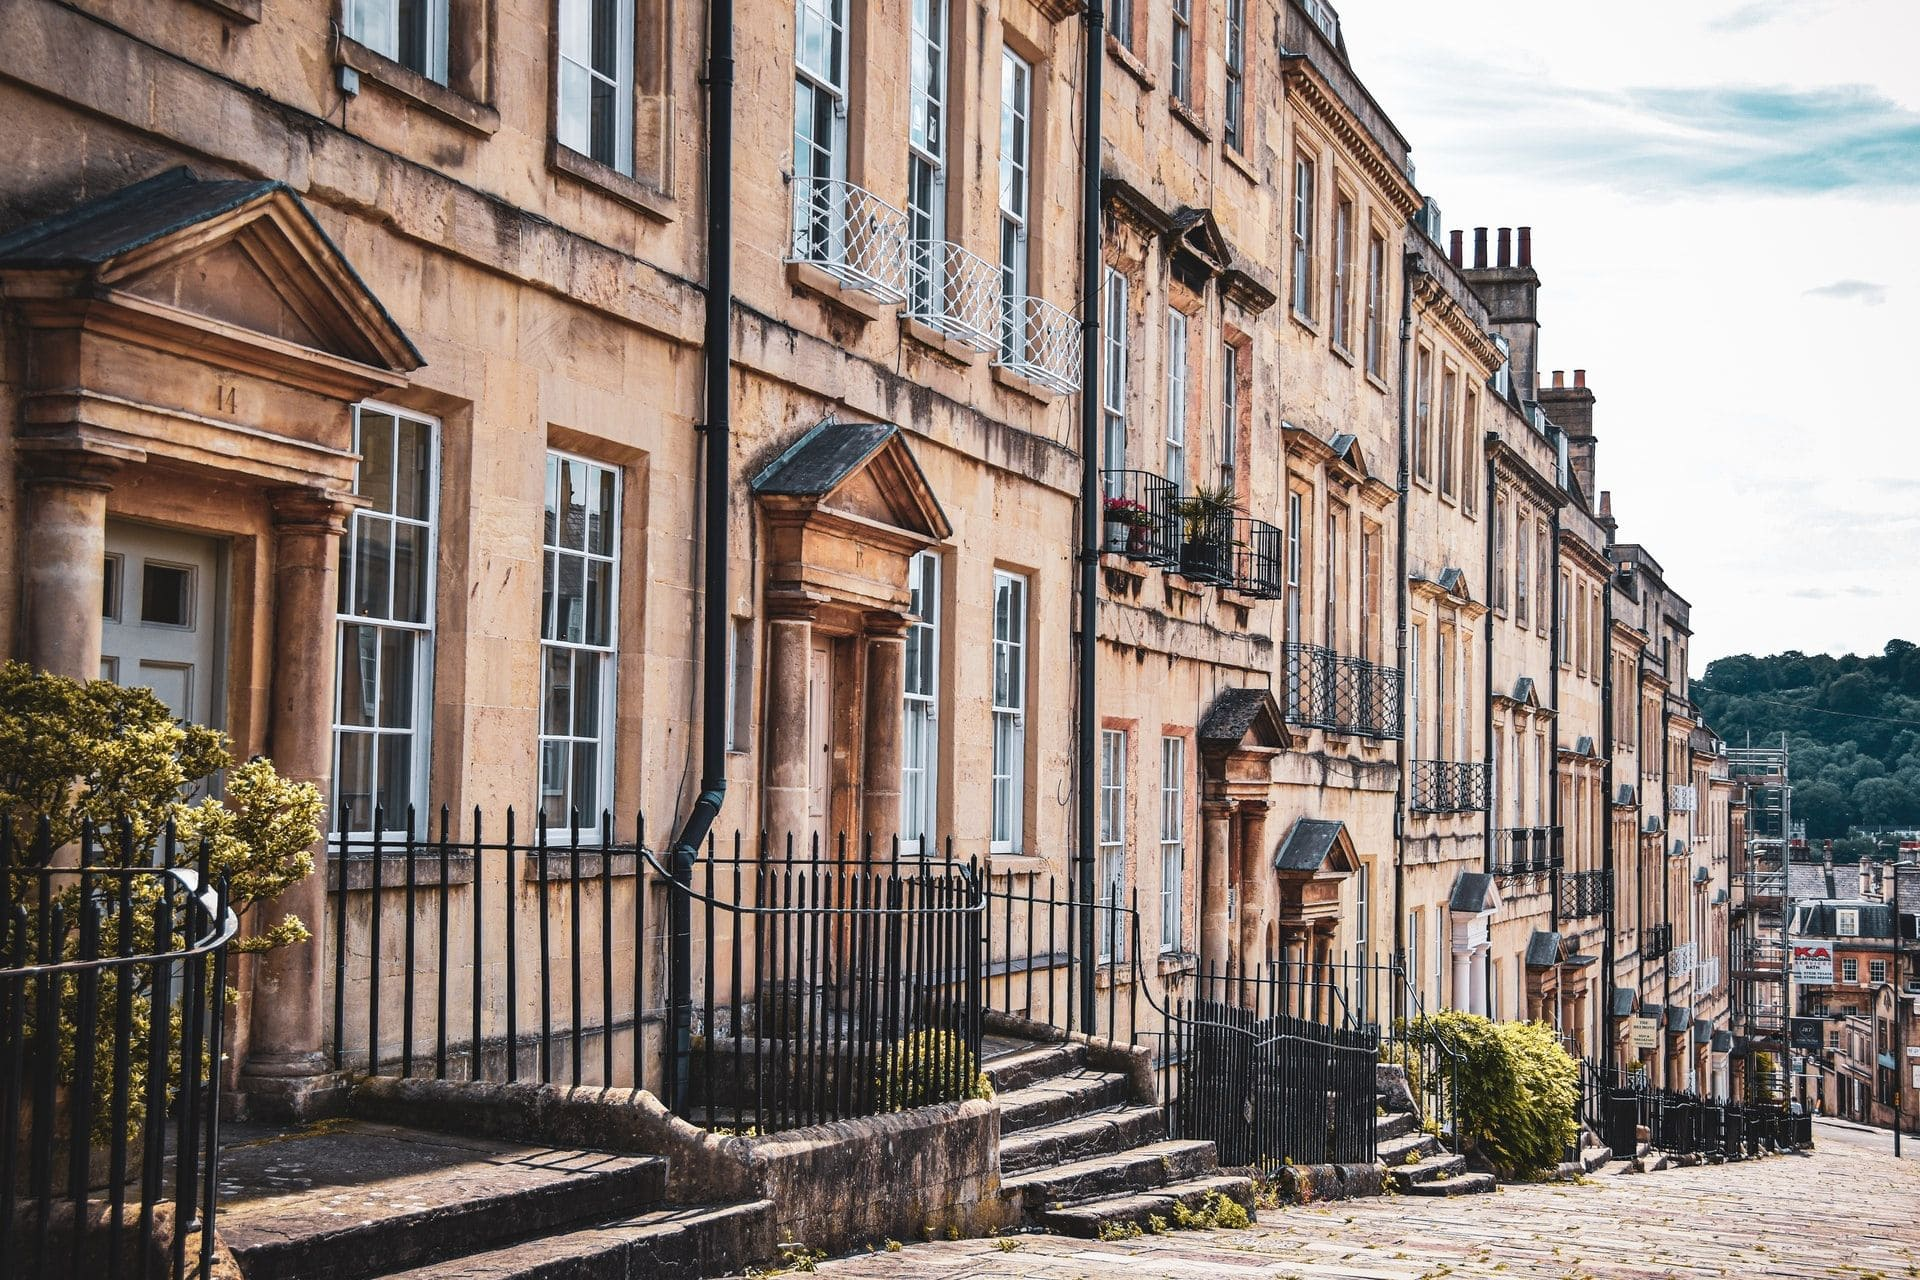 street-of-pretty-terraced-houses-in-bath-england